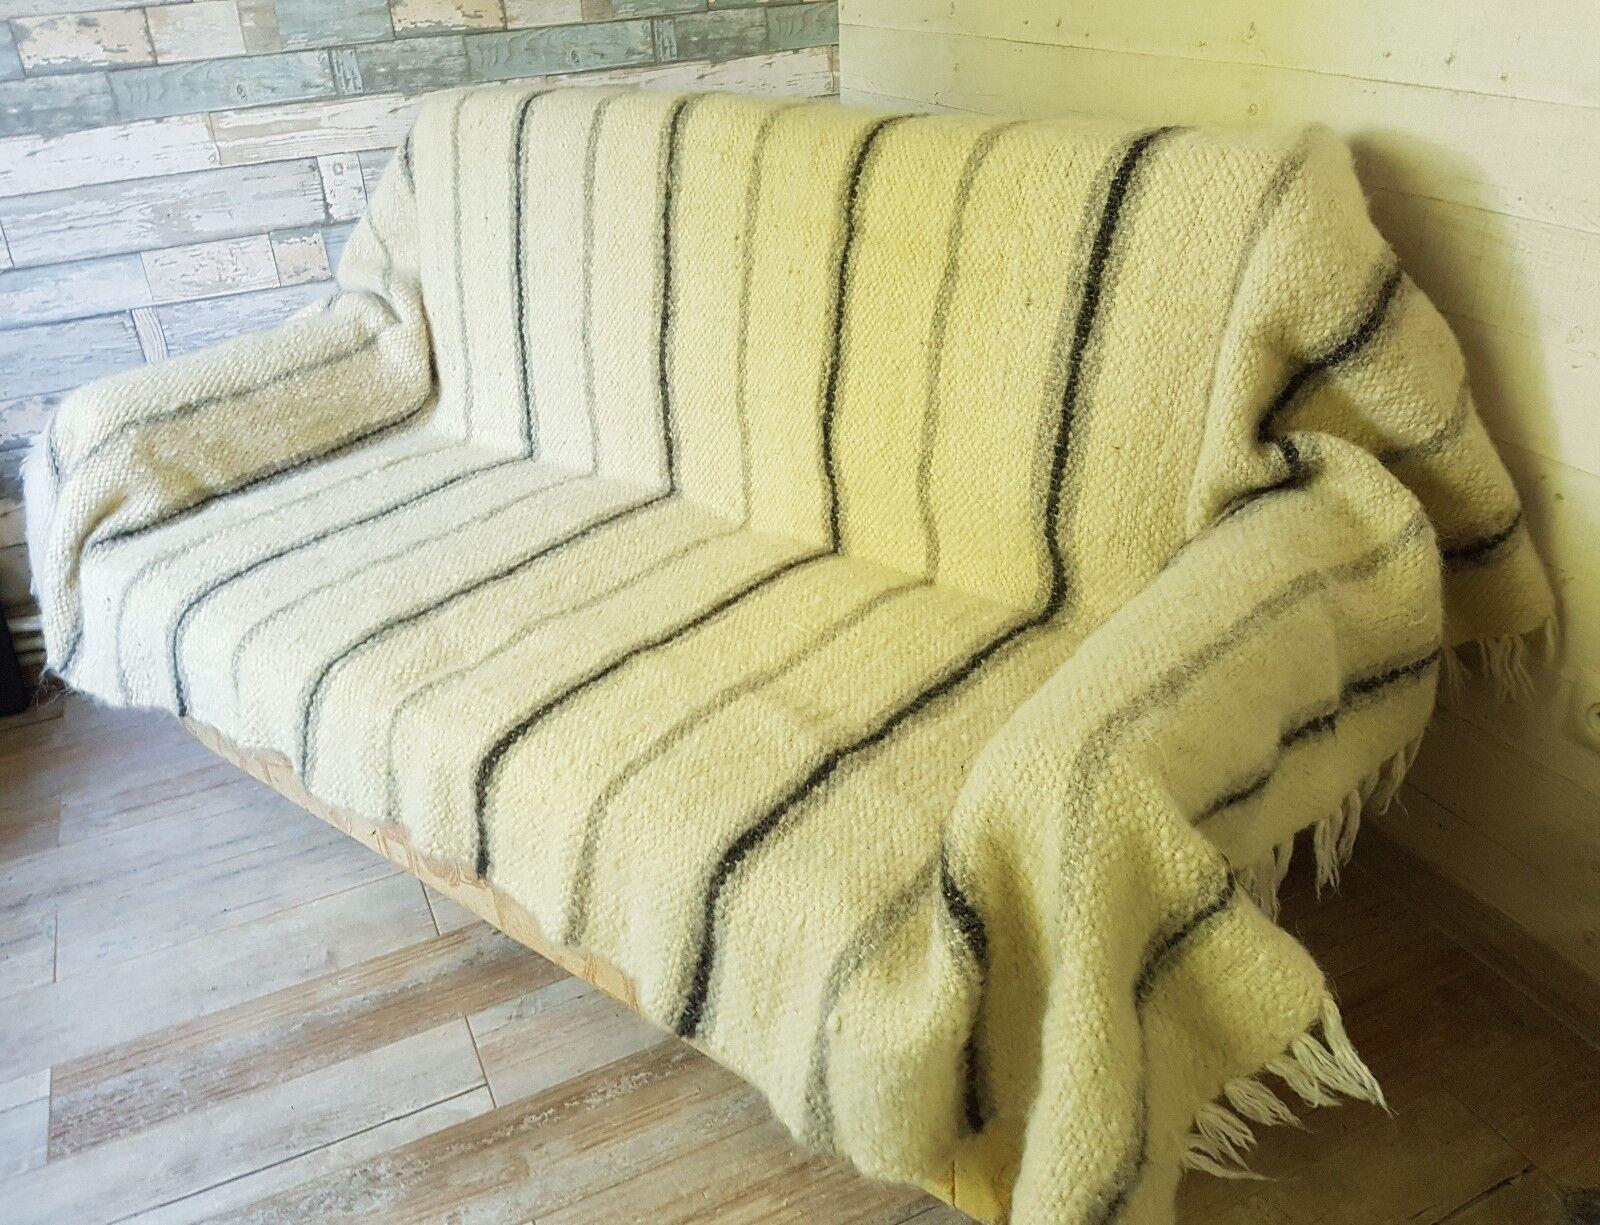 100% PURE Sheep Wool Hutsul handgewebt ECO Blanket   Plaid   Rug 140210 cm